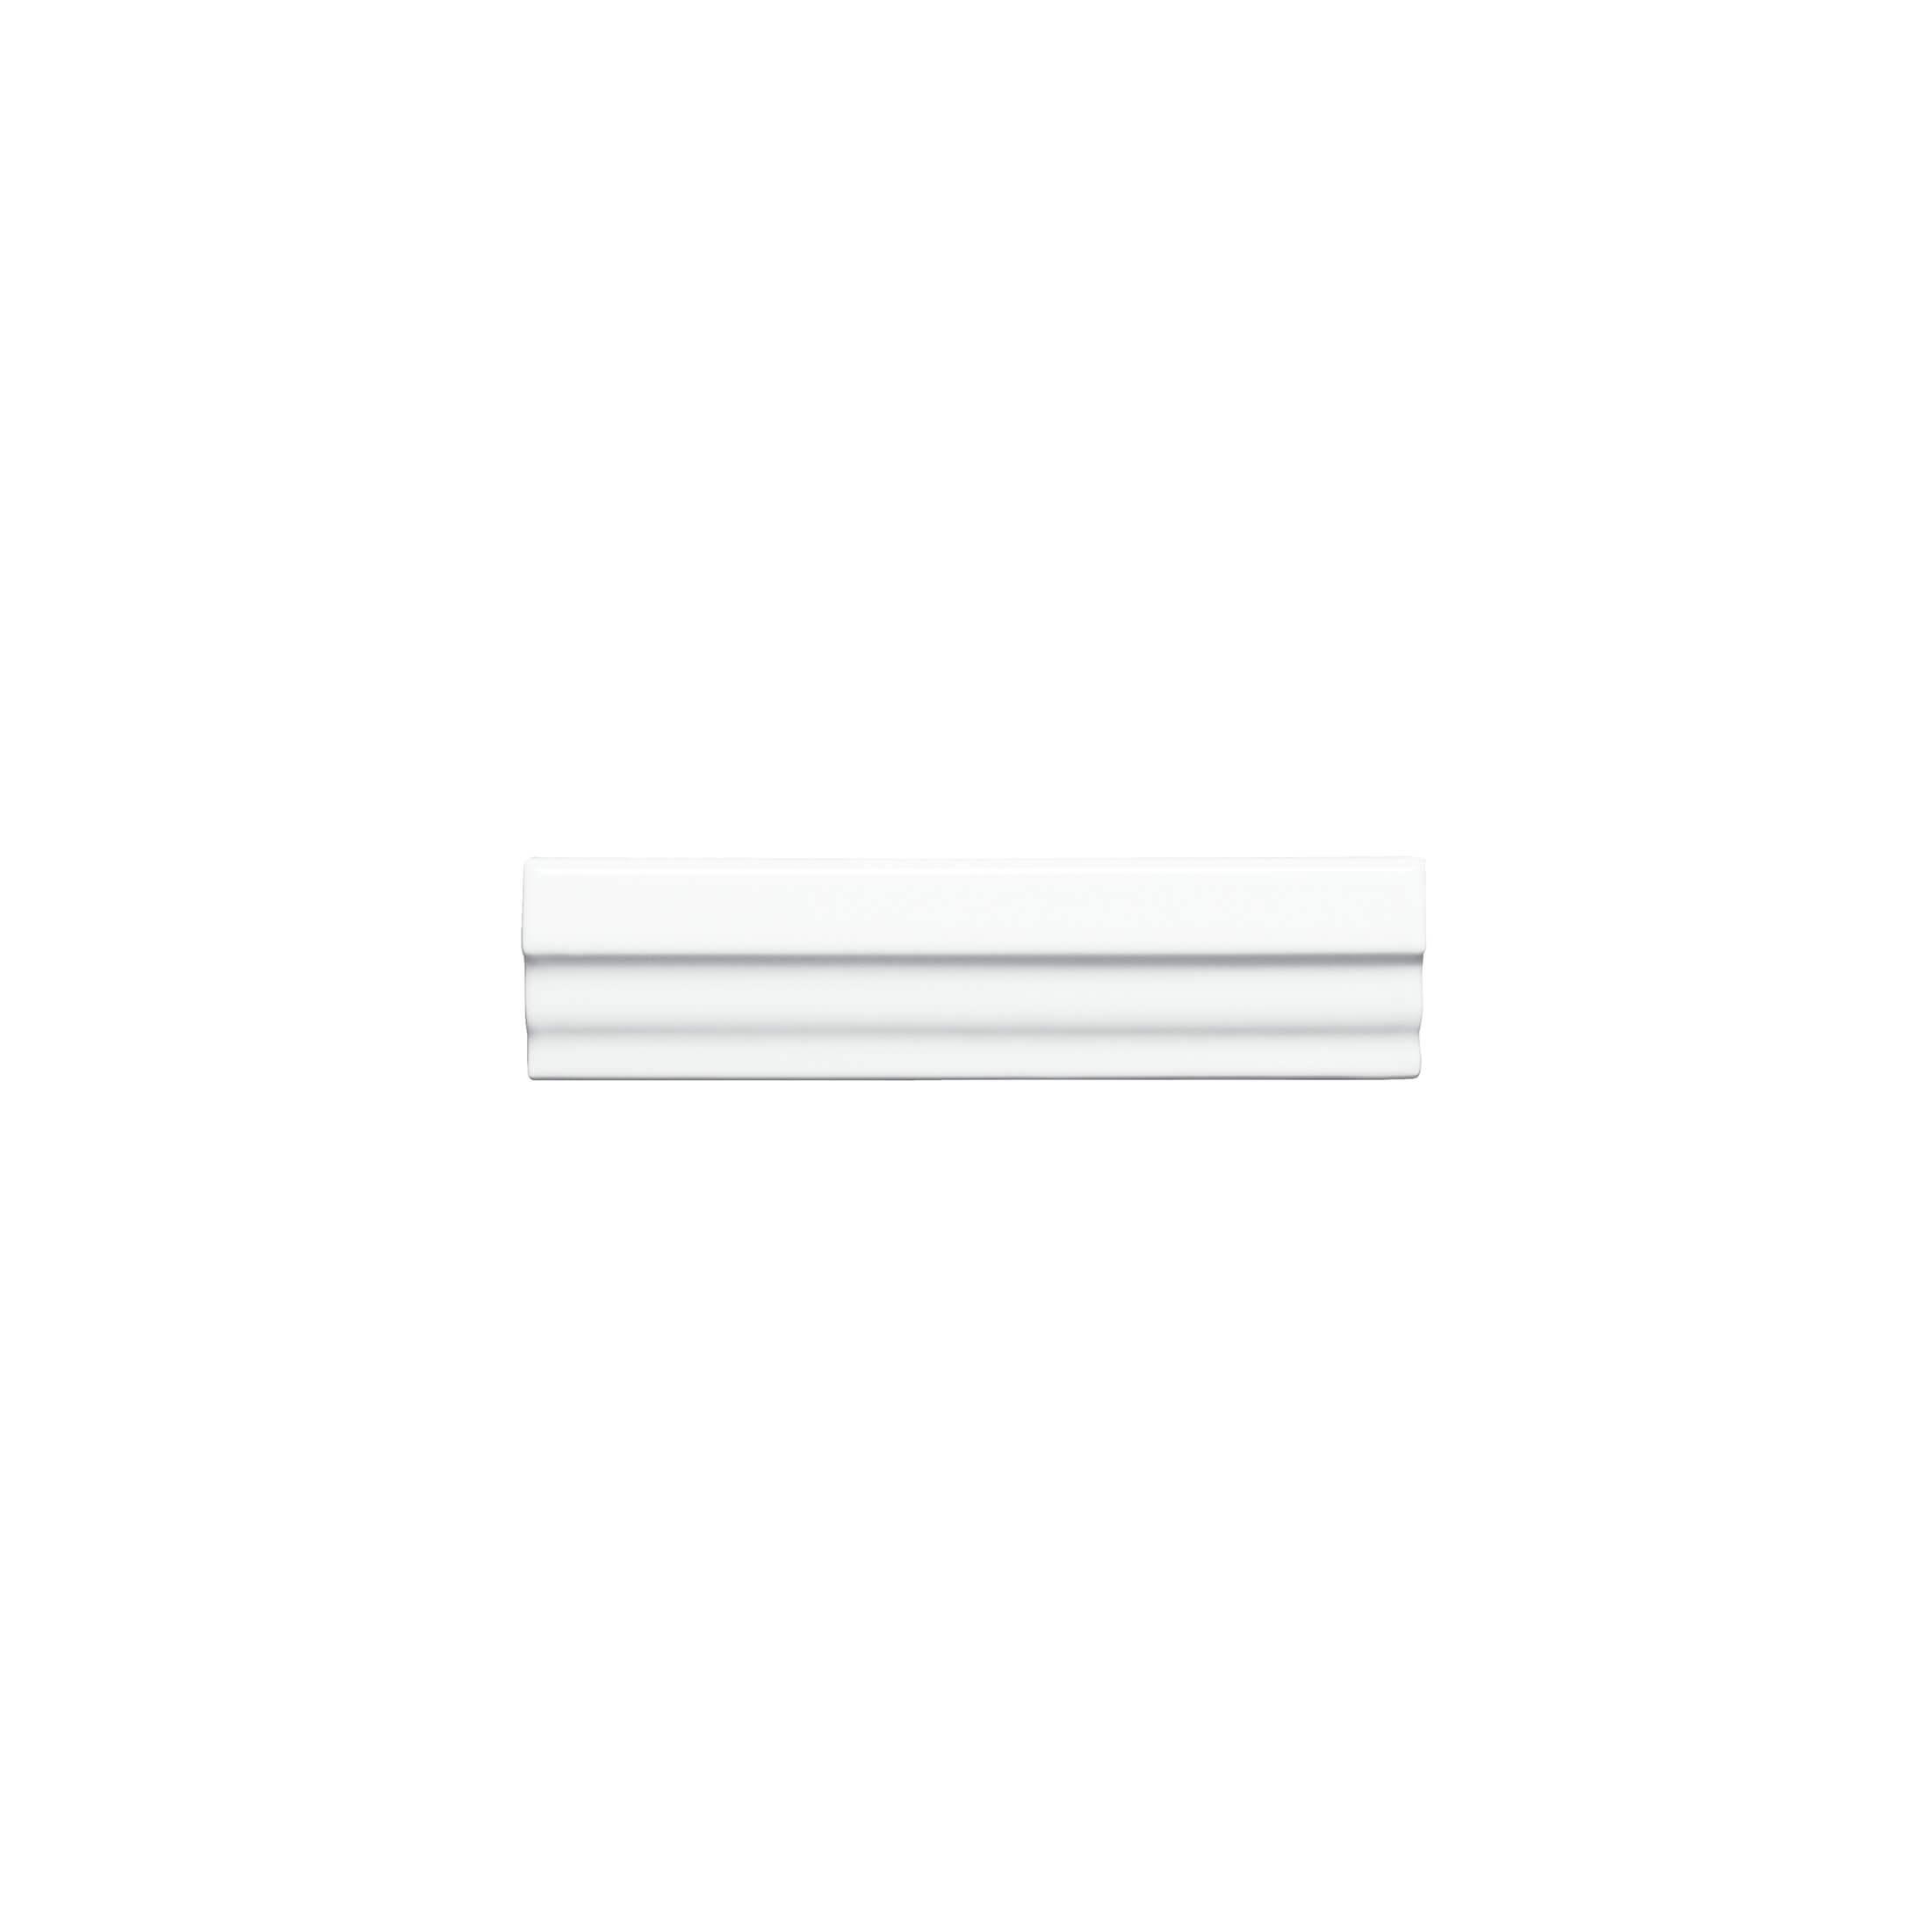 ADNE5329 - CORNISA CLASICA - 3.5 cm X 15 cm